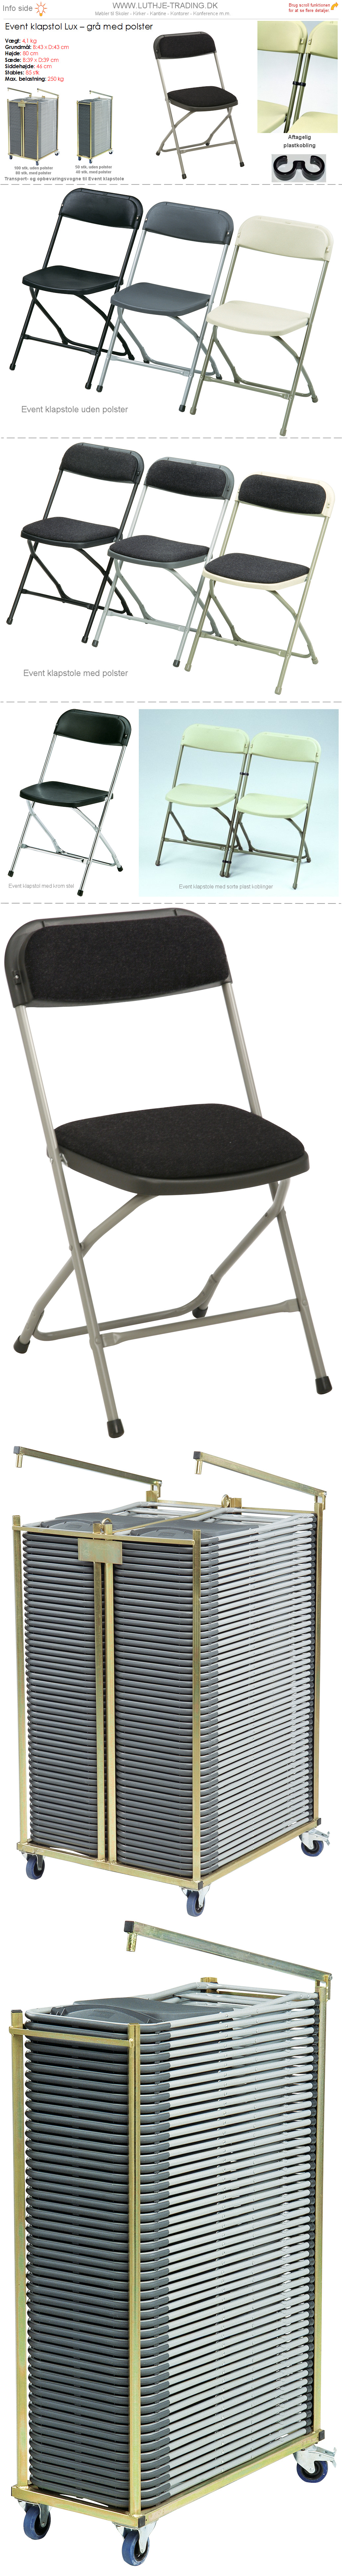 Plaststole grå Event med polster